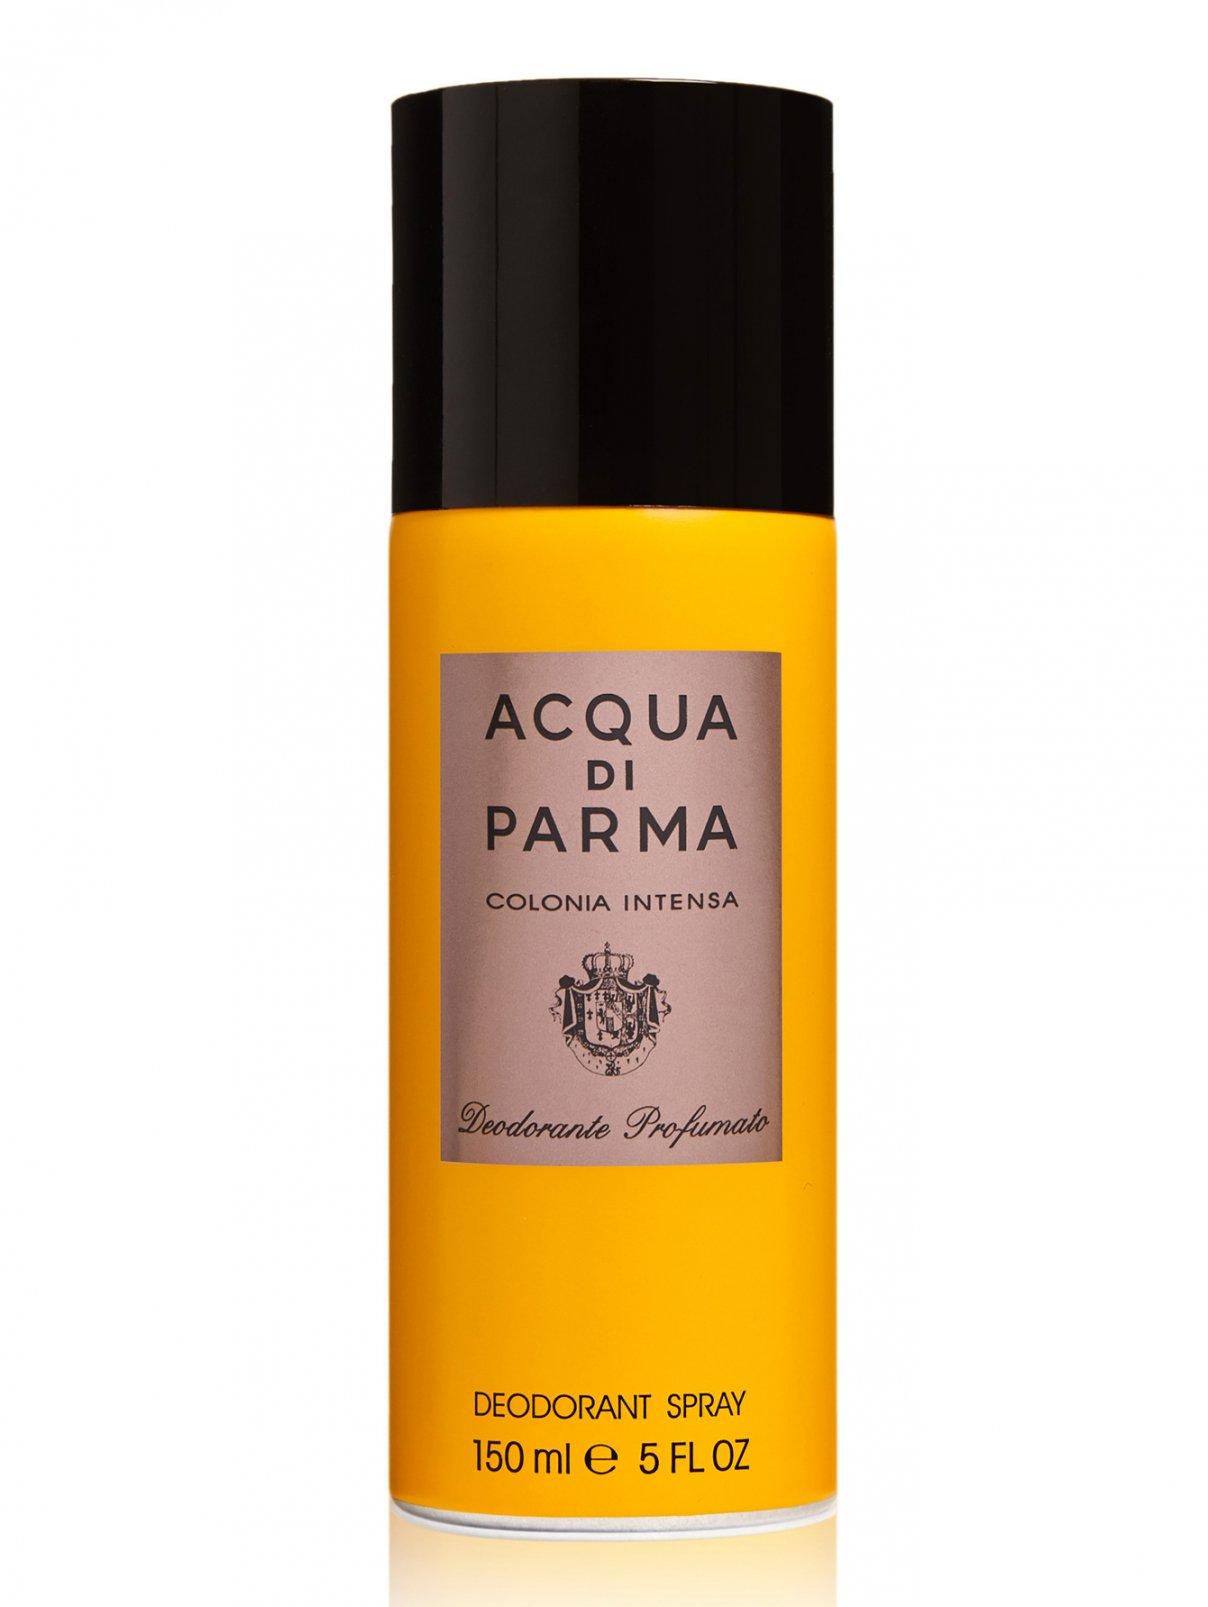 Дезодорант - Colonia Intensa, 150ml Acqua di Parma  –  Общий вид